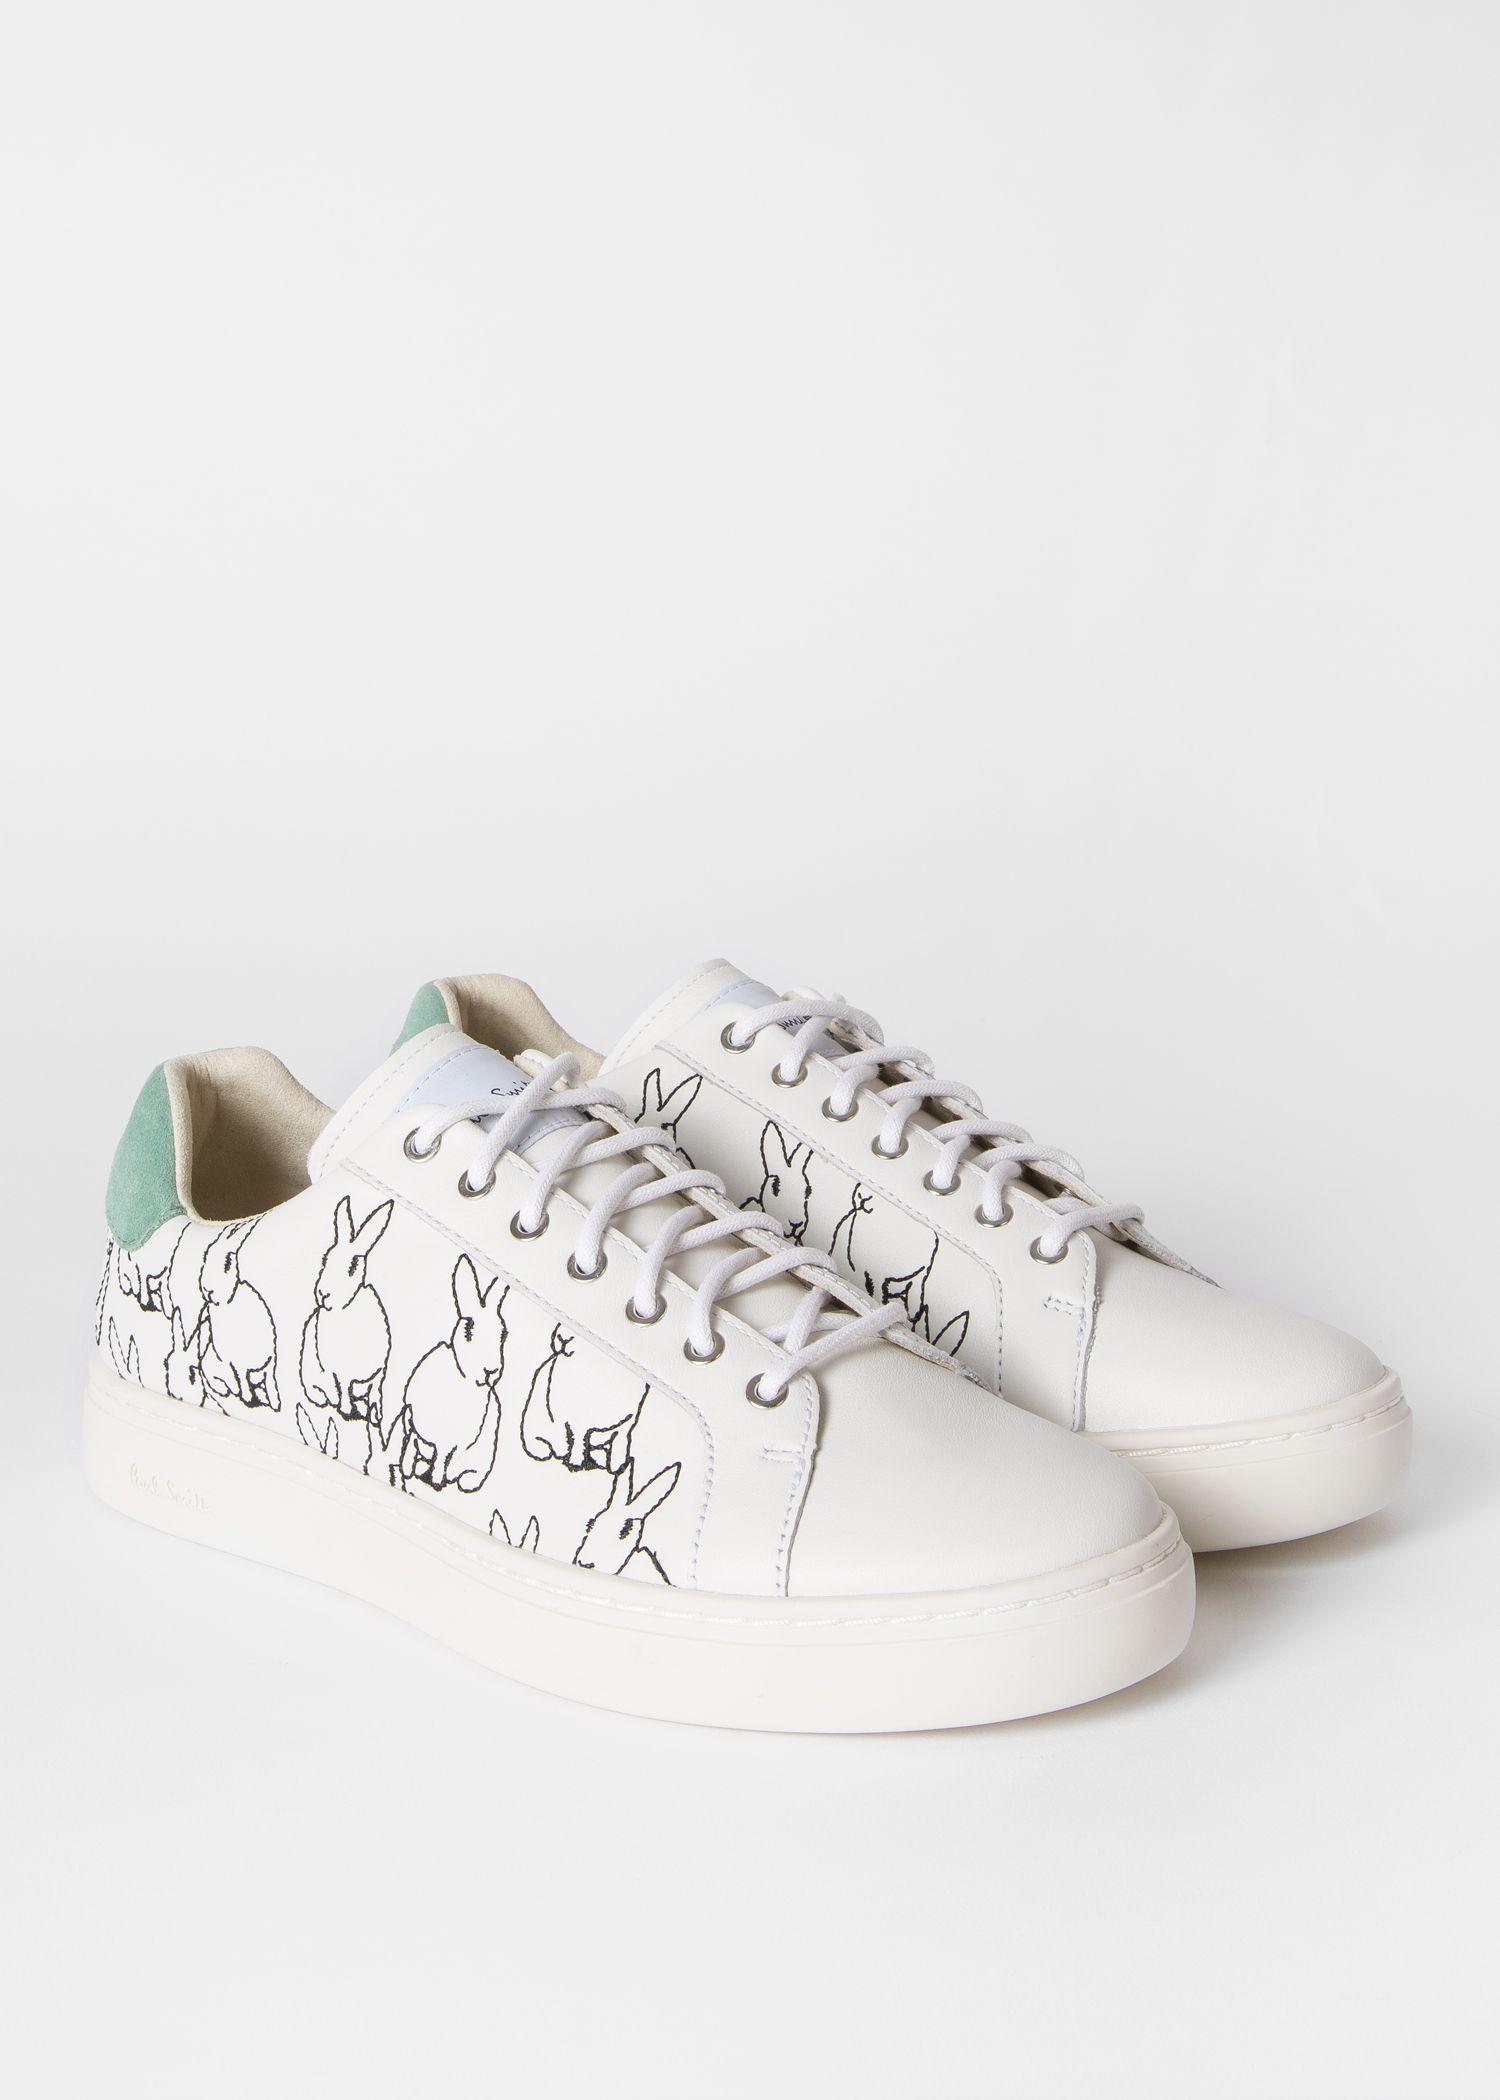 Green suede heel, Sneakers, Leather